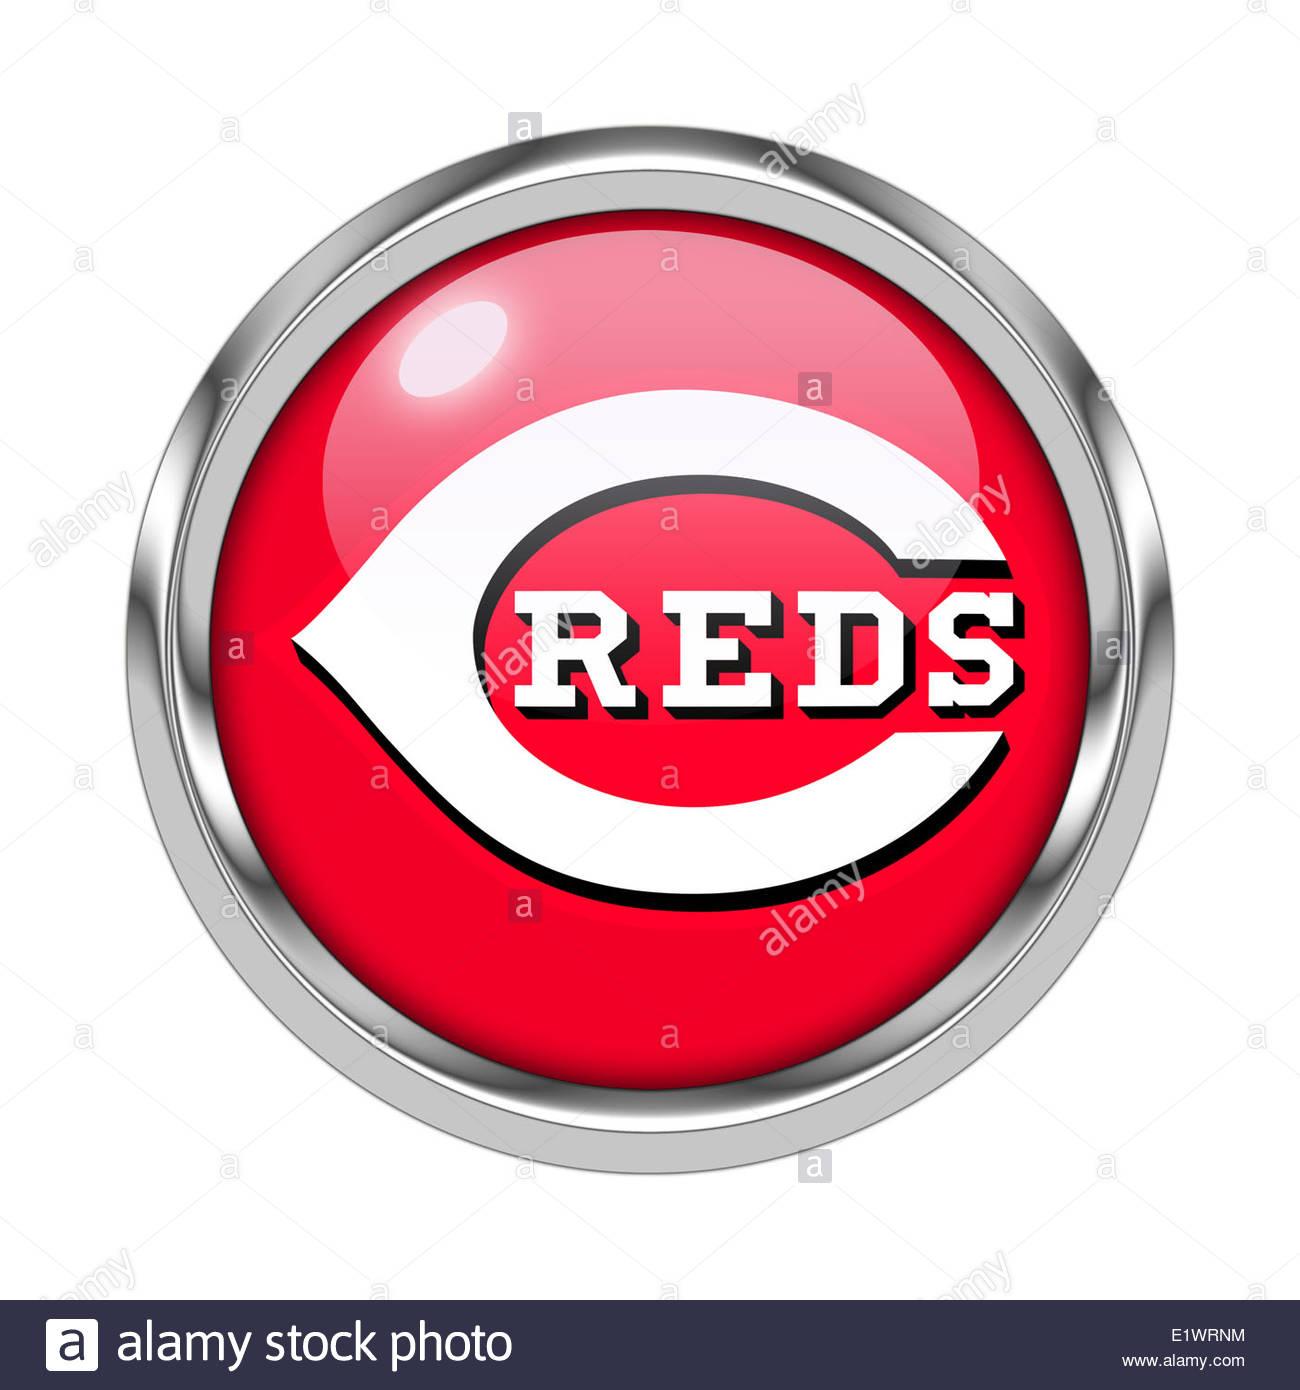 Cincinnati Reds icon logo isolated app button - Stock Image